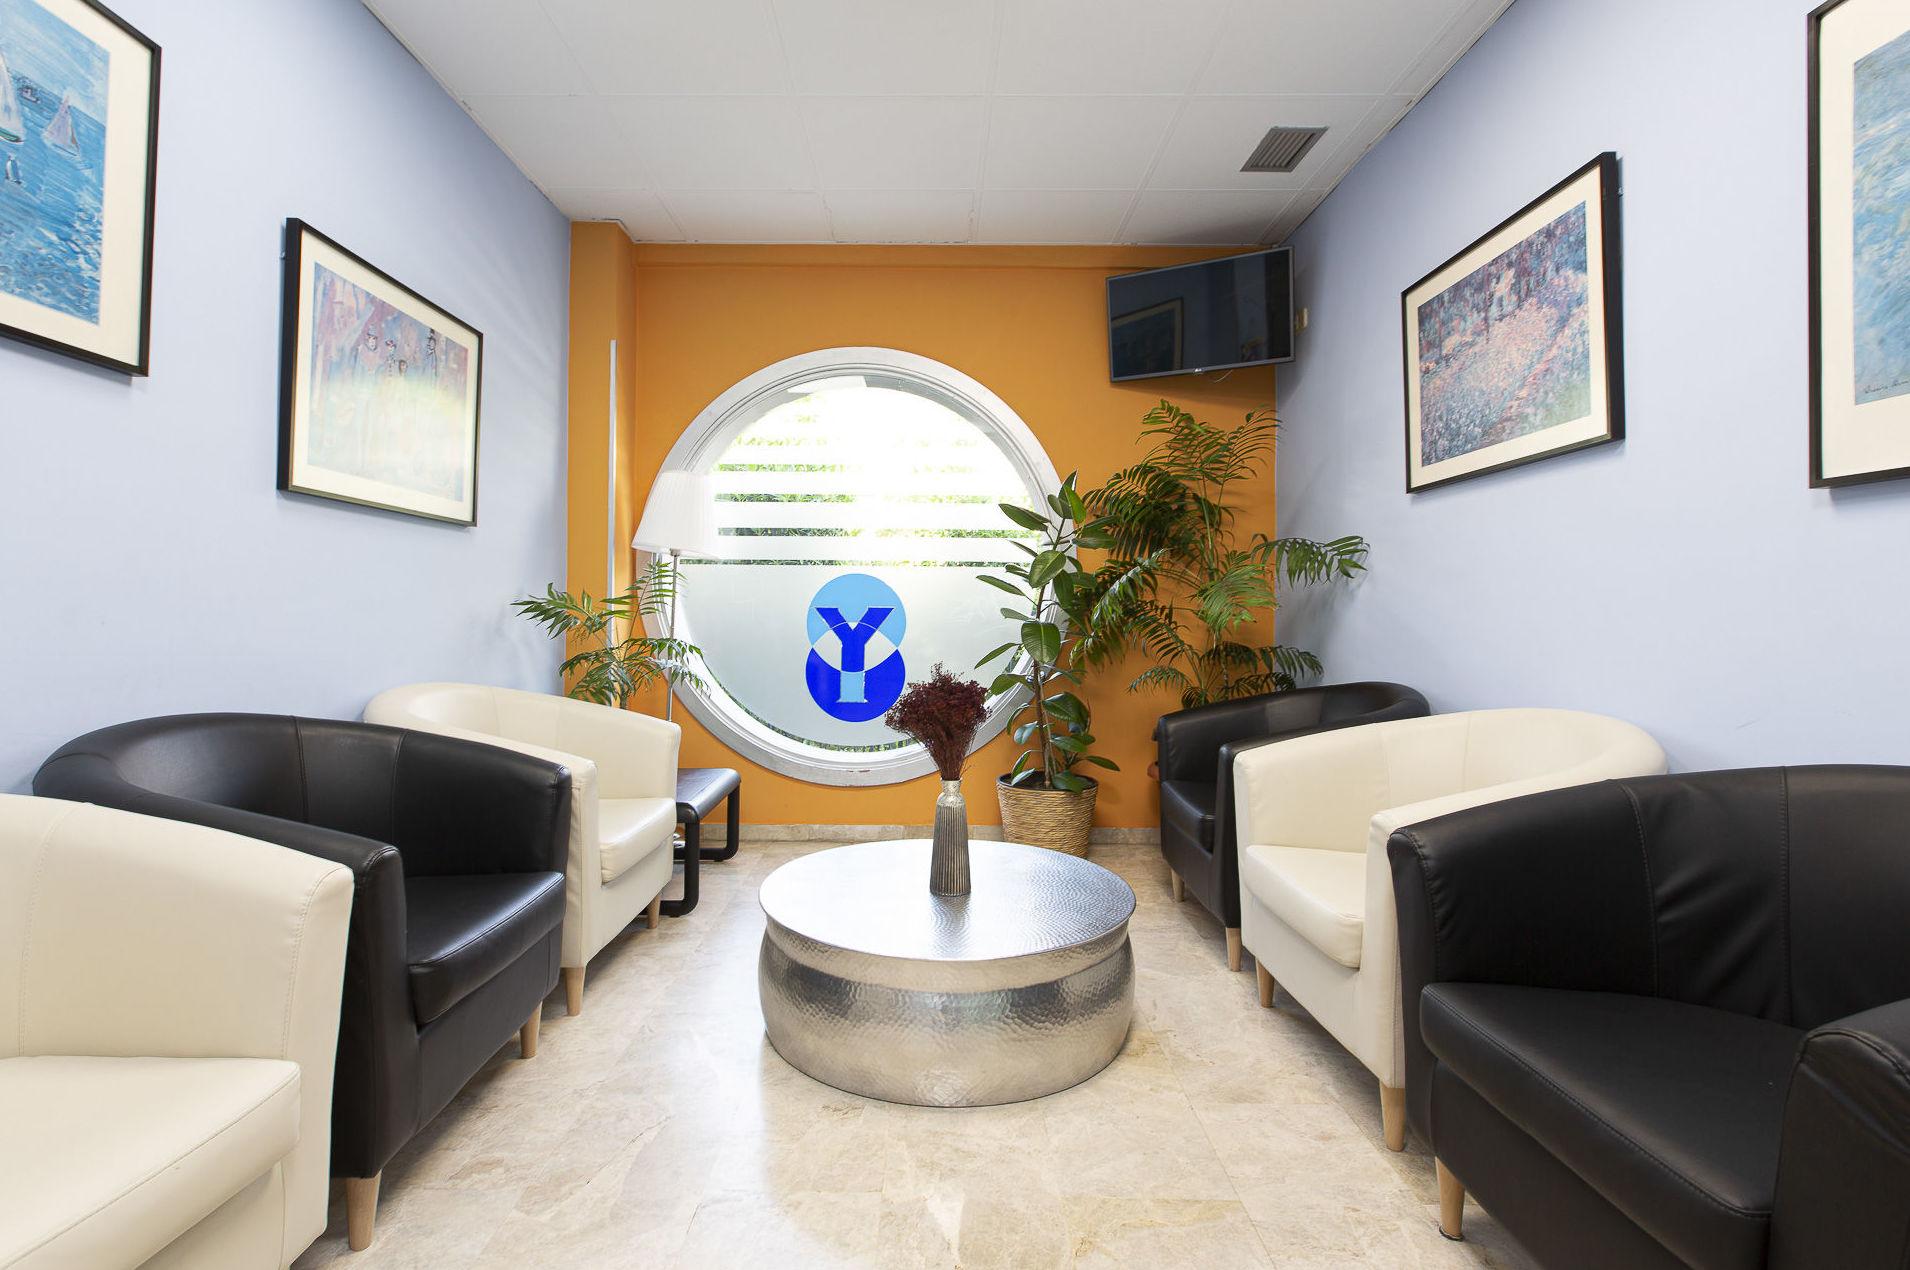 Foto 3 de Dentistas en  | Clínica Dental Dr. Yagüe